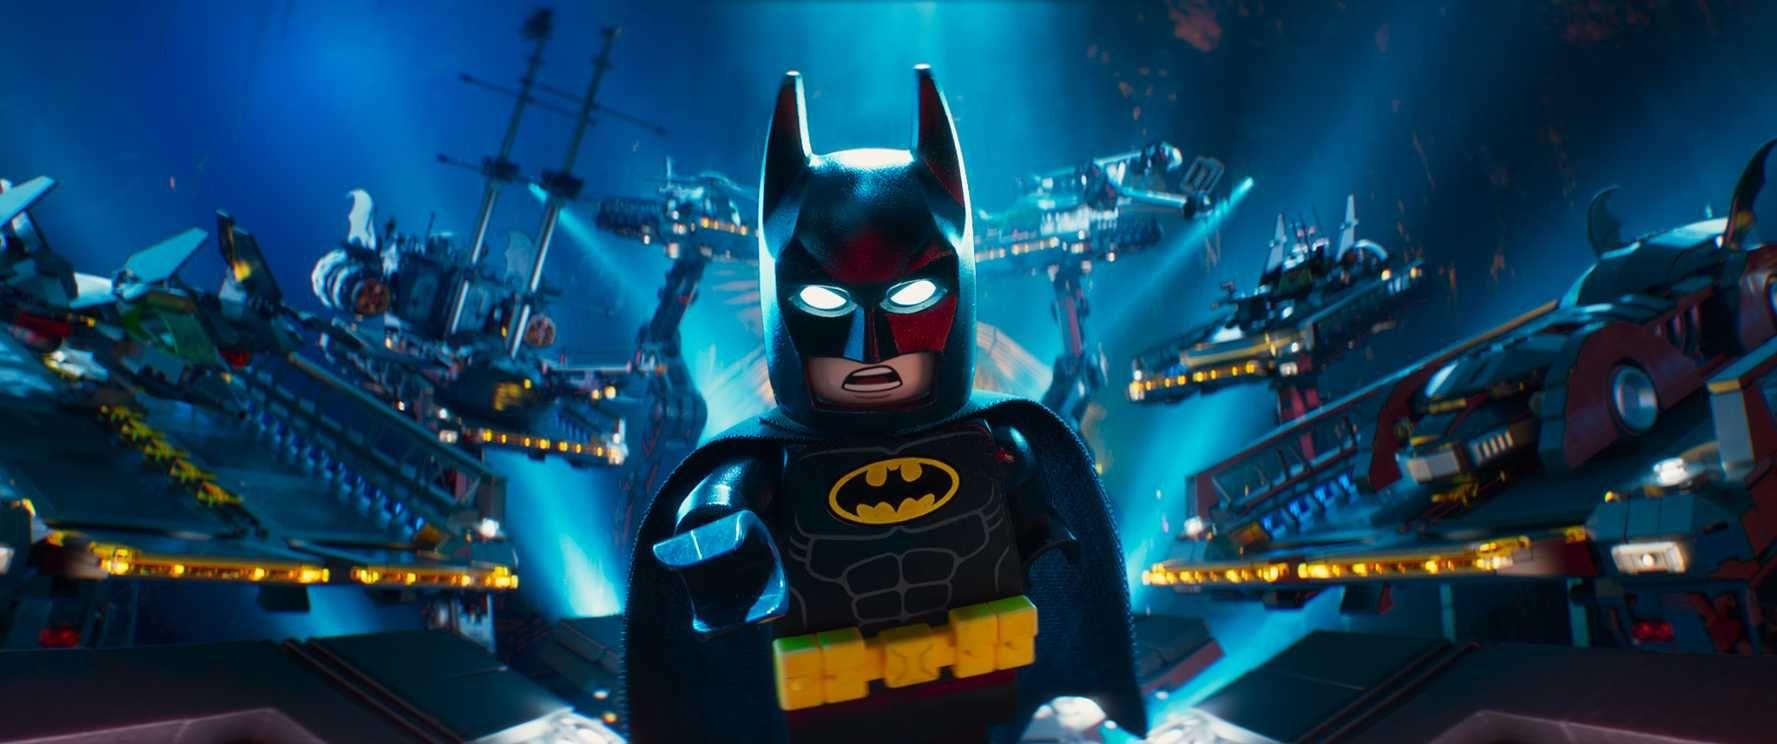 The LEGO Batman Movie (2017) Torrent Download DVDRip YIFY ...